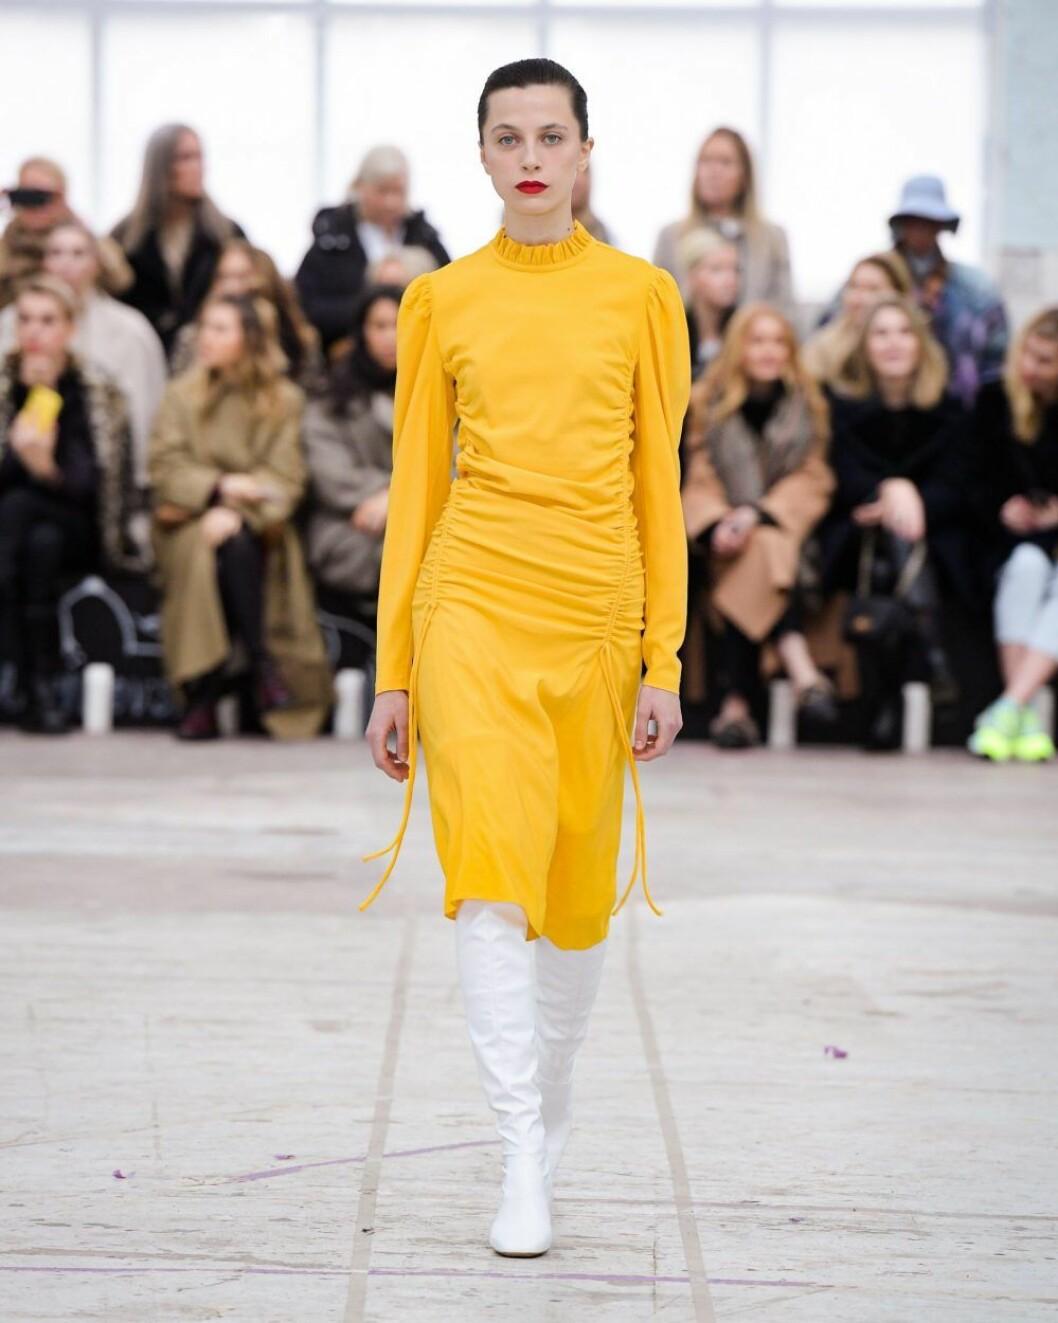 Solgul klänning från By Malene Birger AW20.